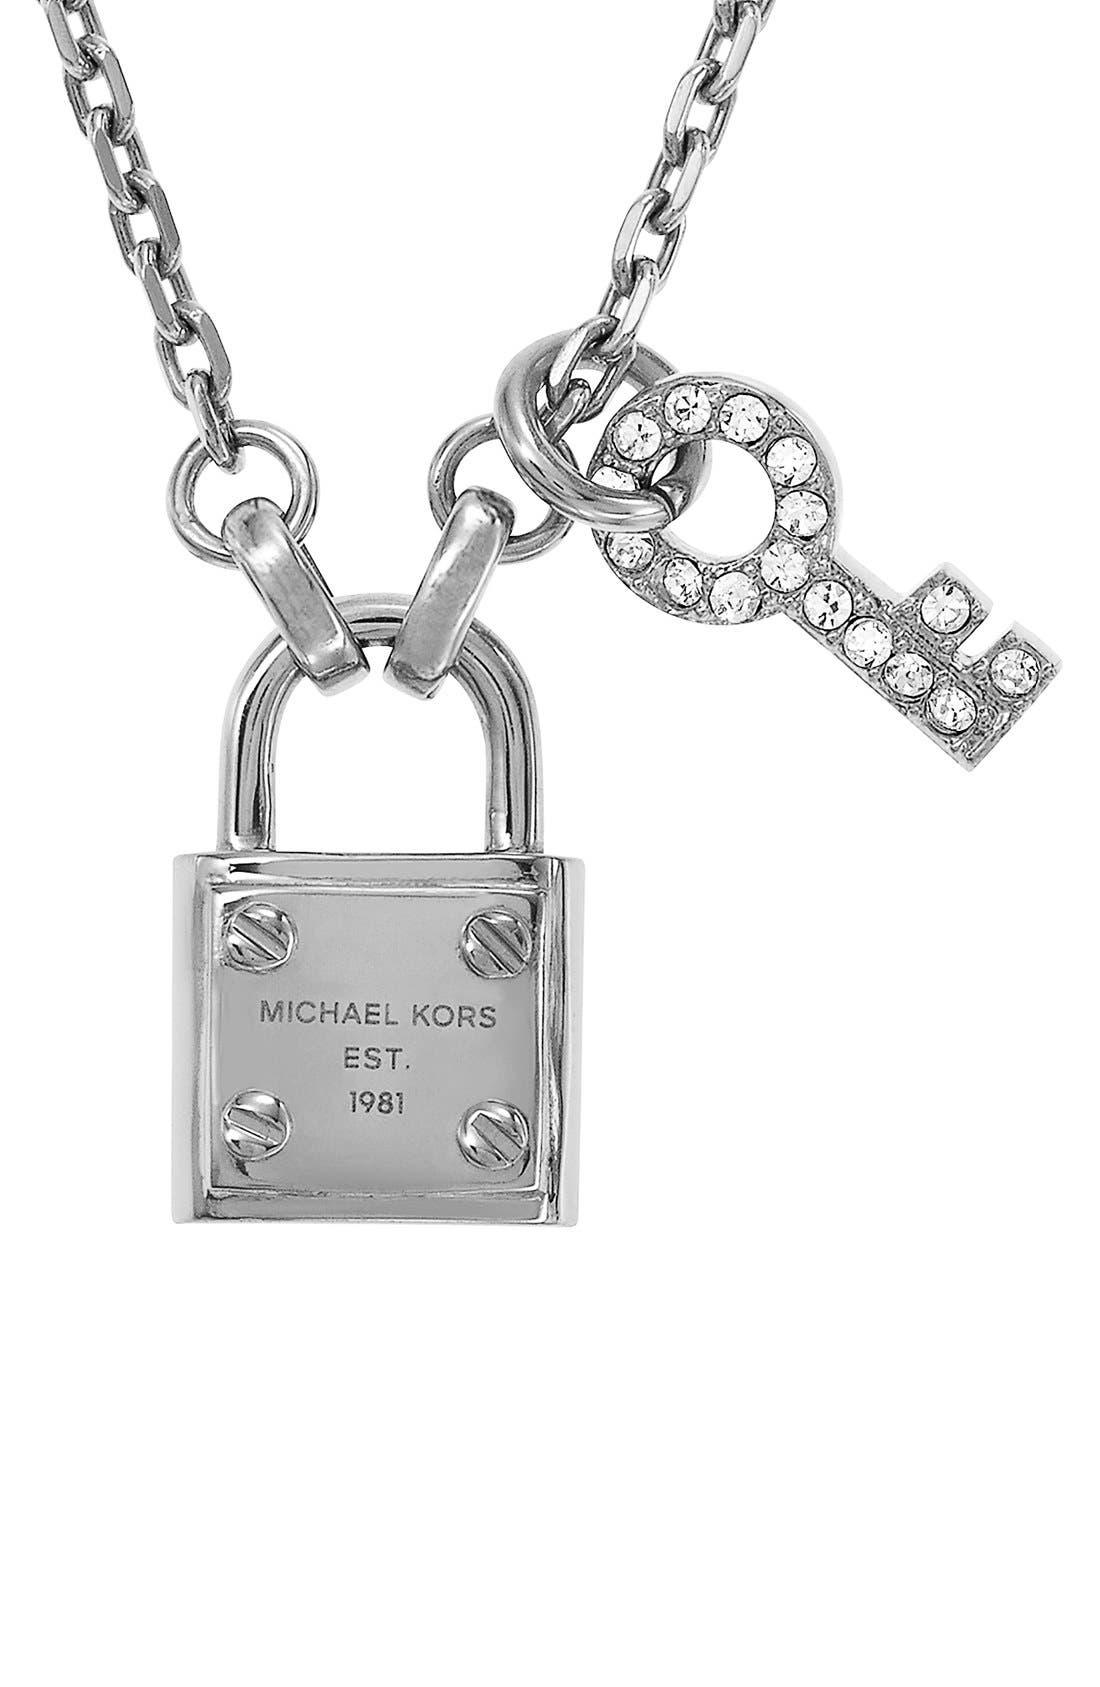 Main Image - Michael Kors 'Brilliance' Lock & Key Charm Necklace